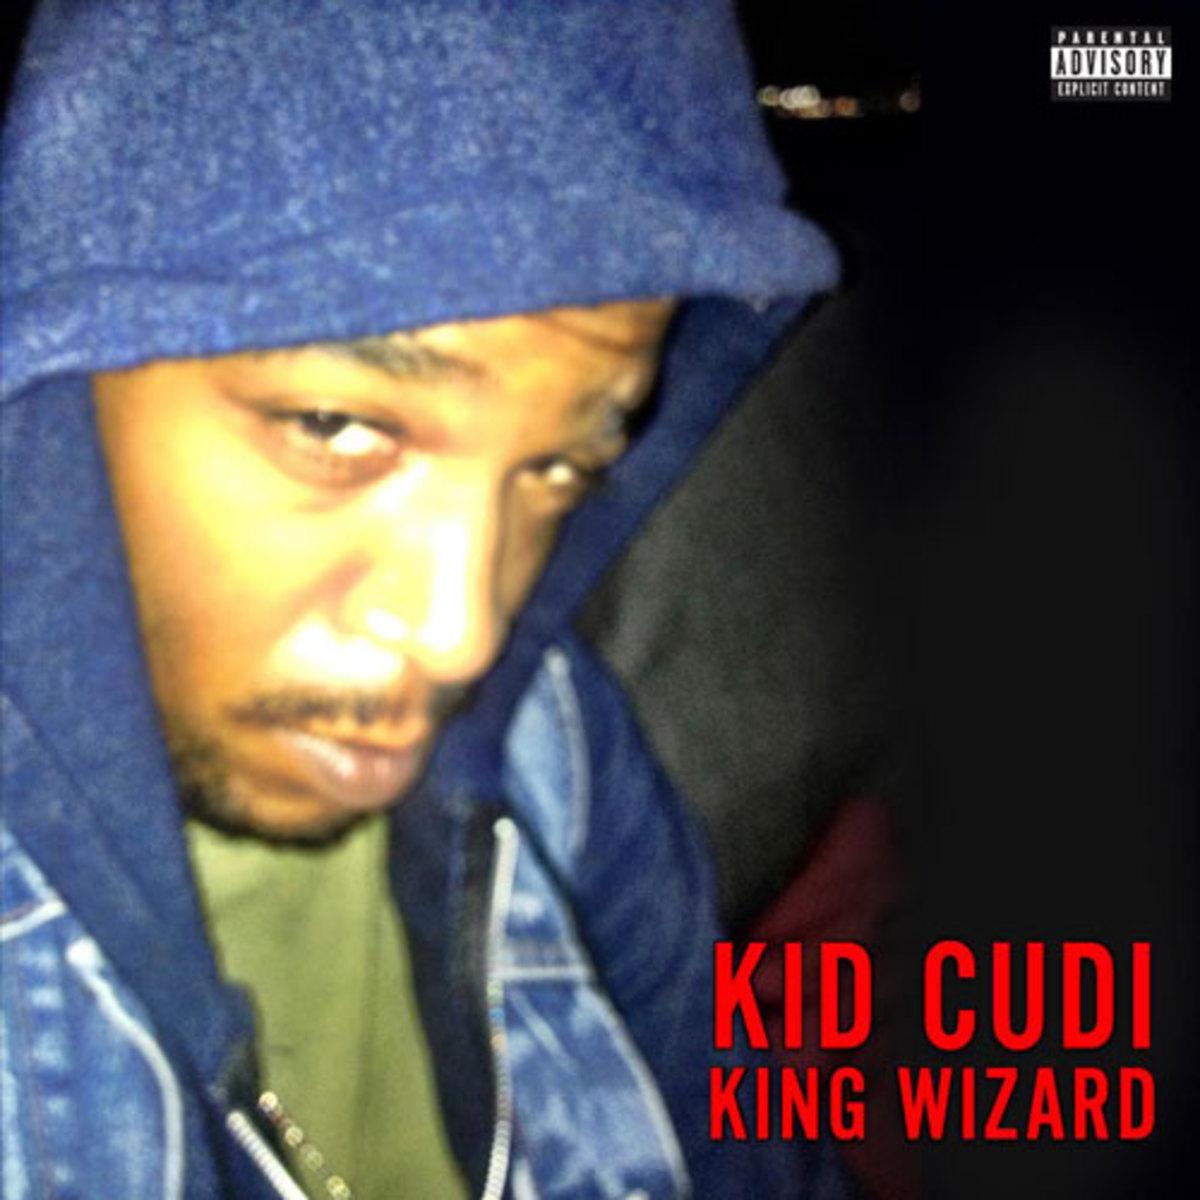 kidcudi-kingwizard.jpg